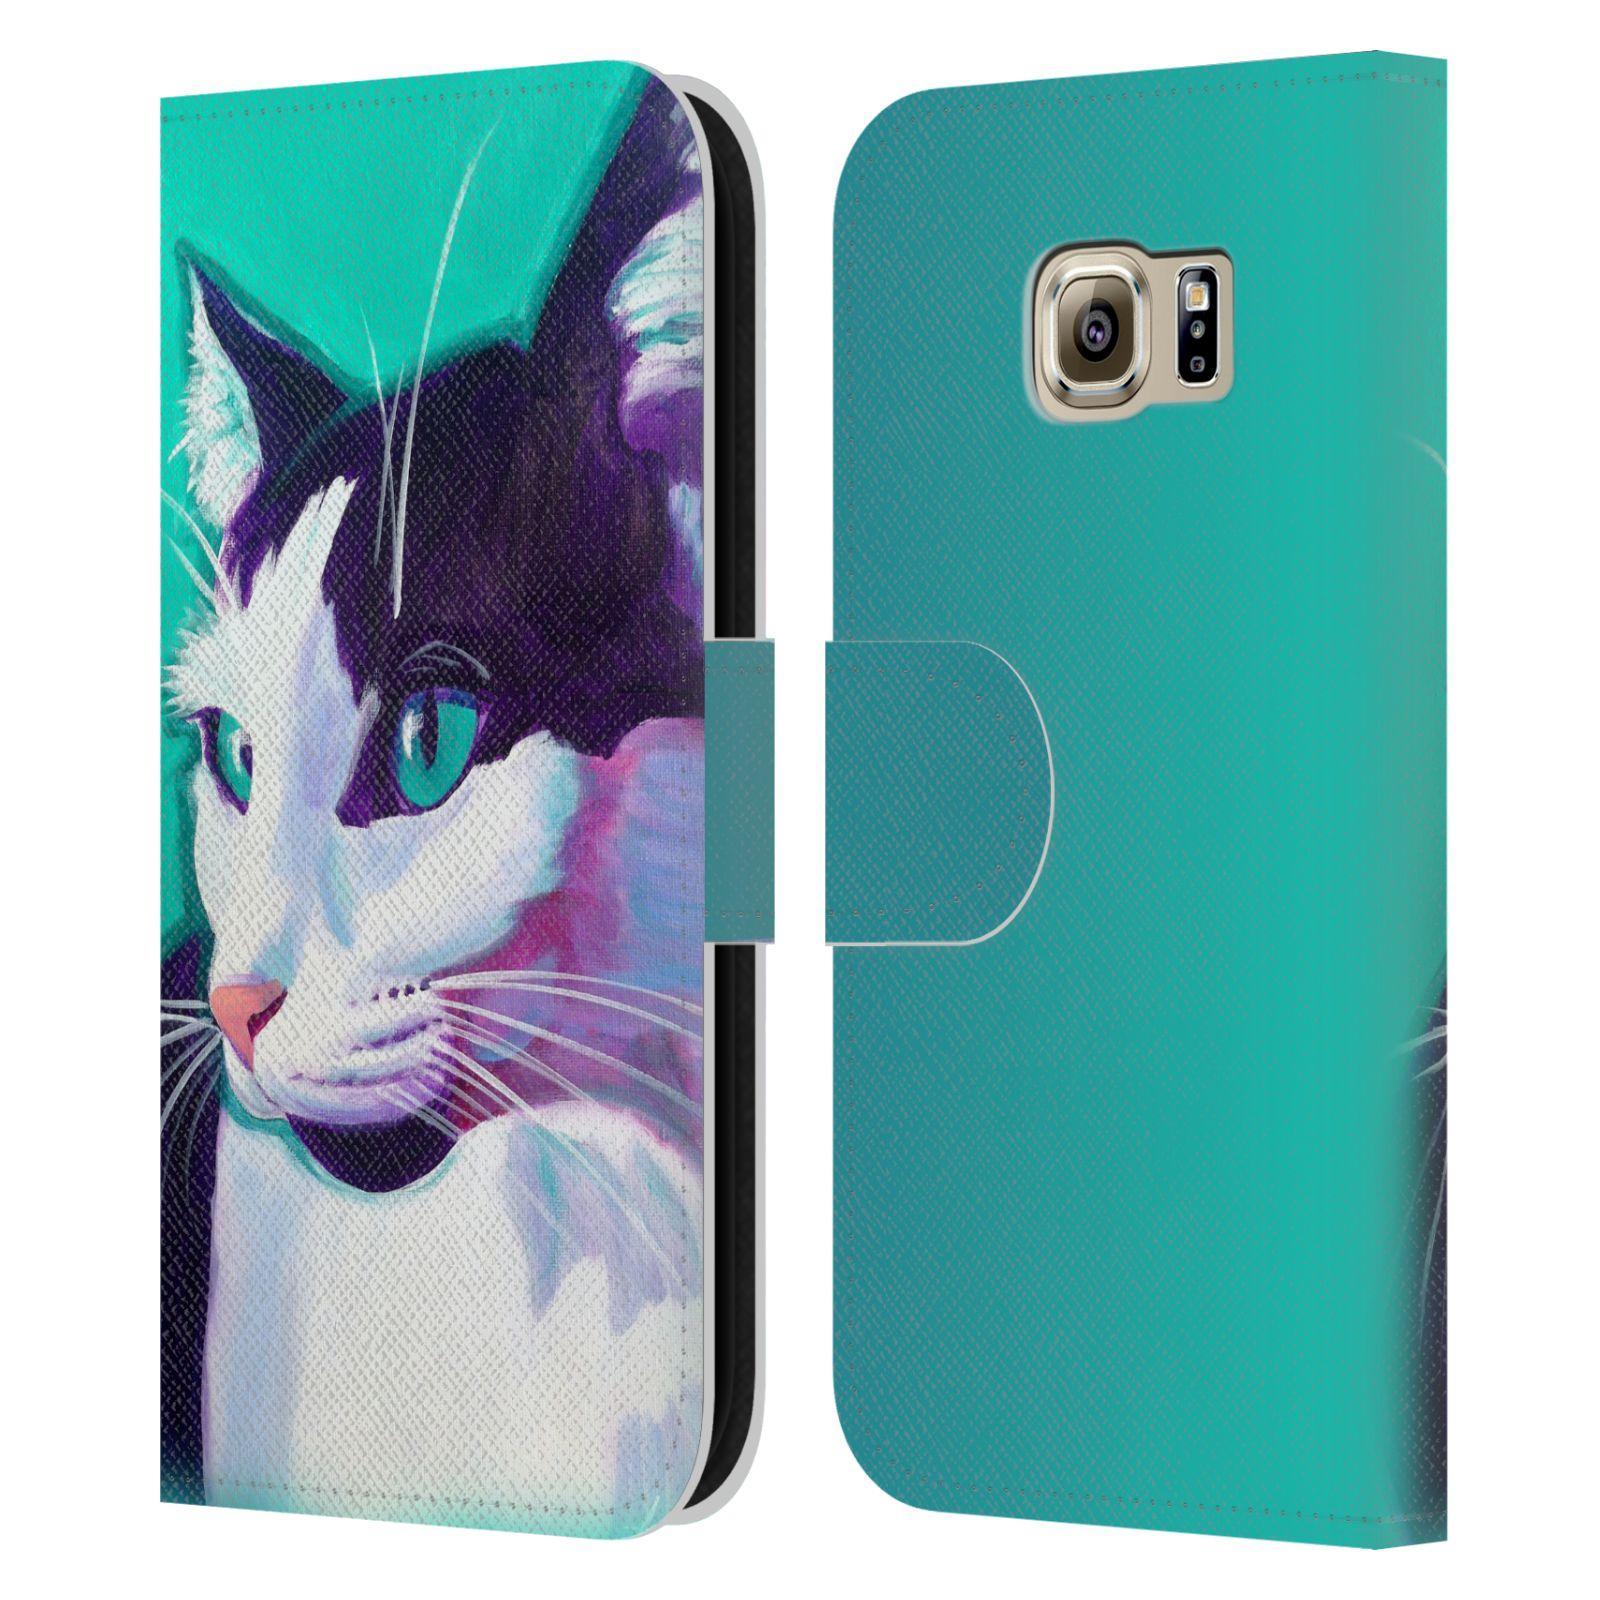 Handyhulle Iphone S Ebay